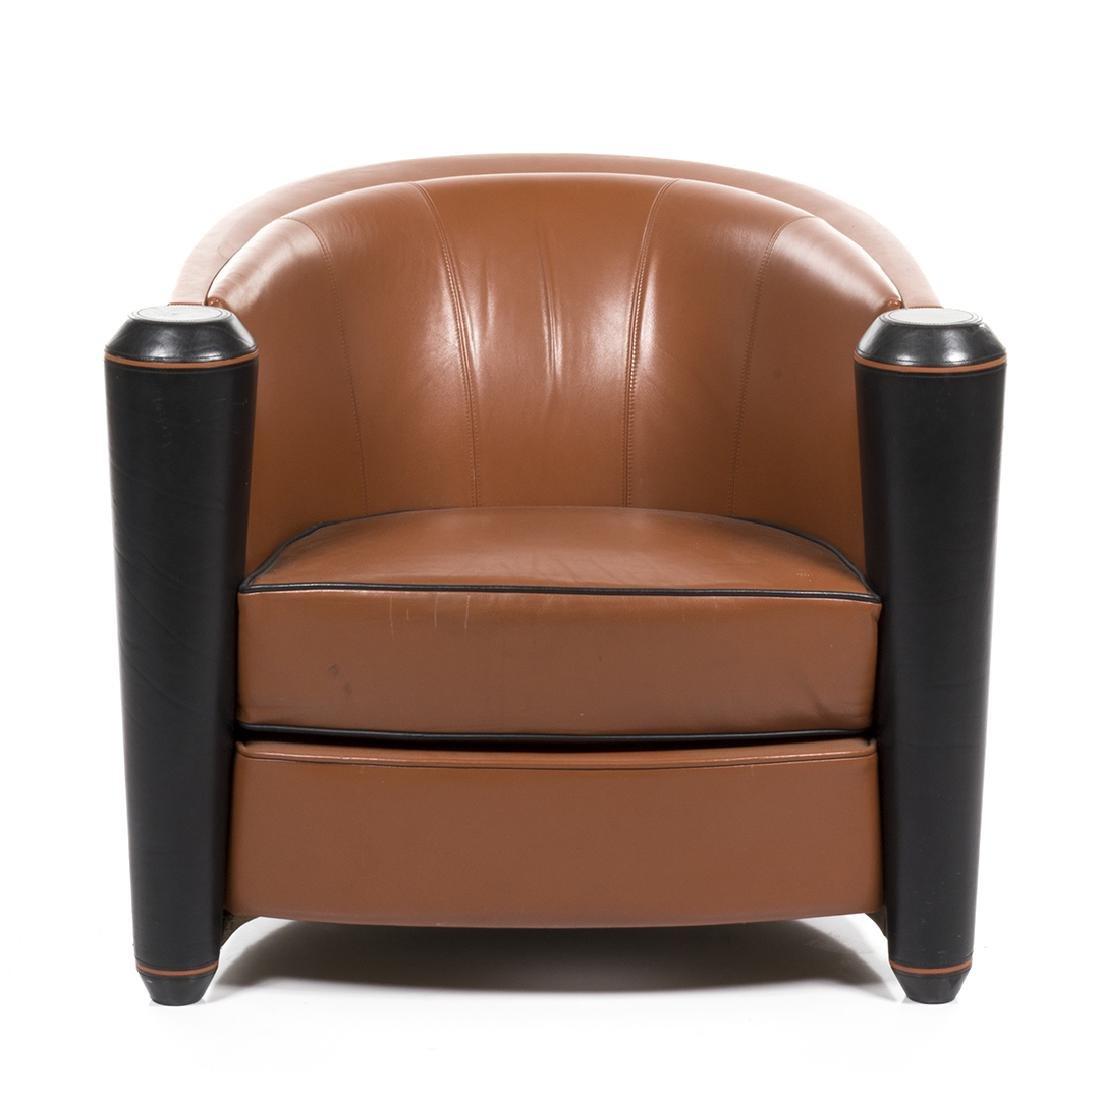 Adam Tihany Club Chair - 2